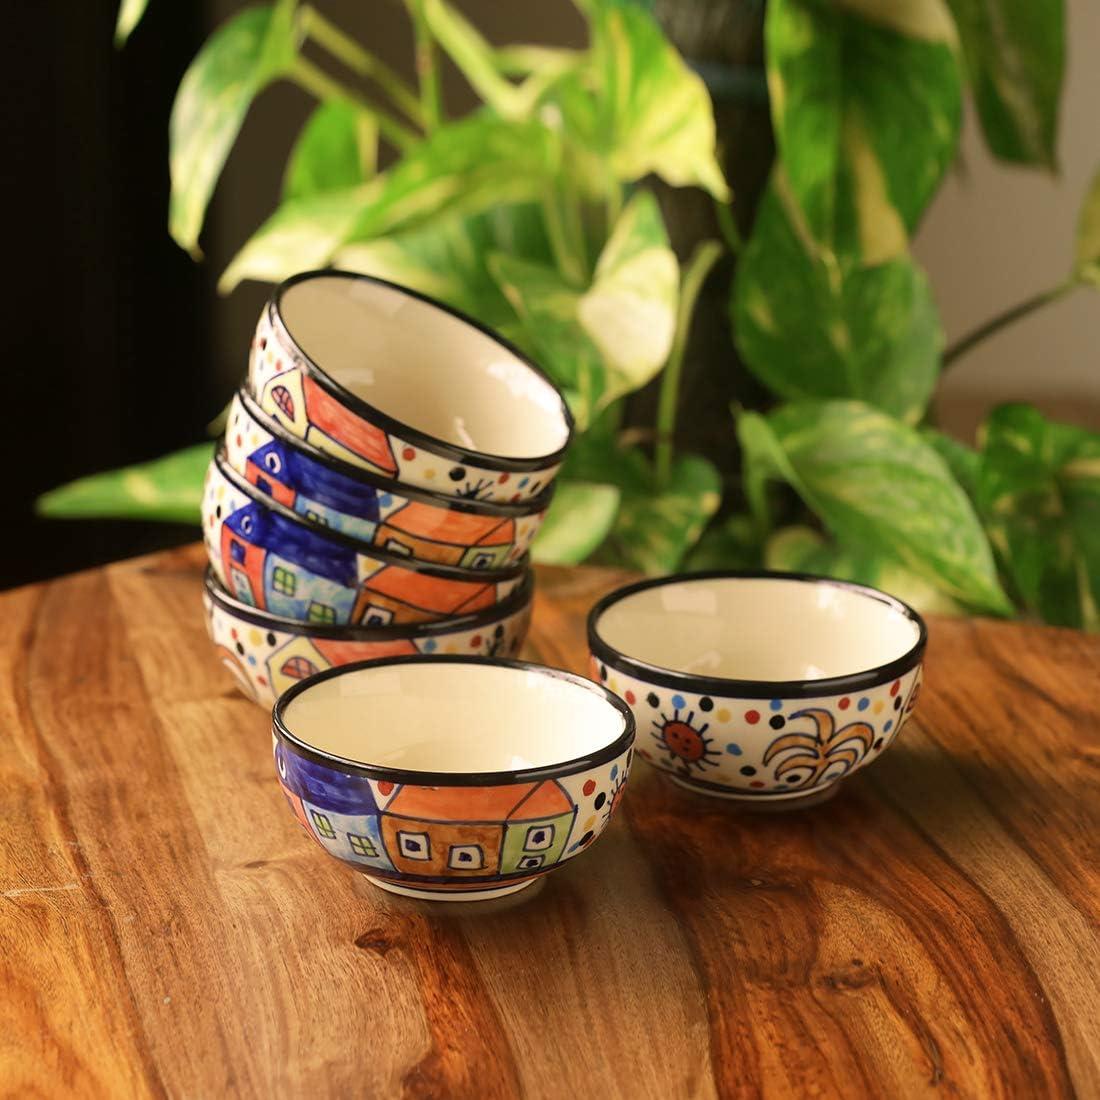 ExclusiveLane The Serving Hut Overseas parallel import regular item Cheap SALE Start Goblets Cereal Ceramic Set 6 Bowl